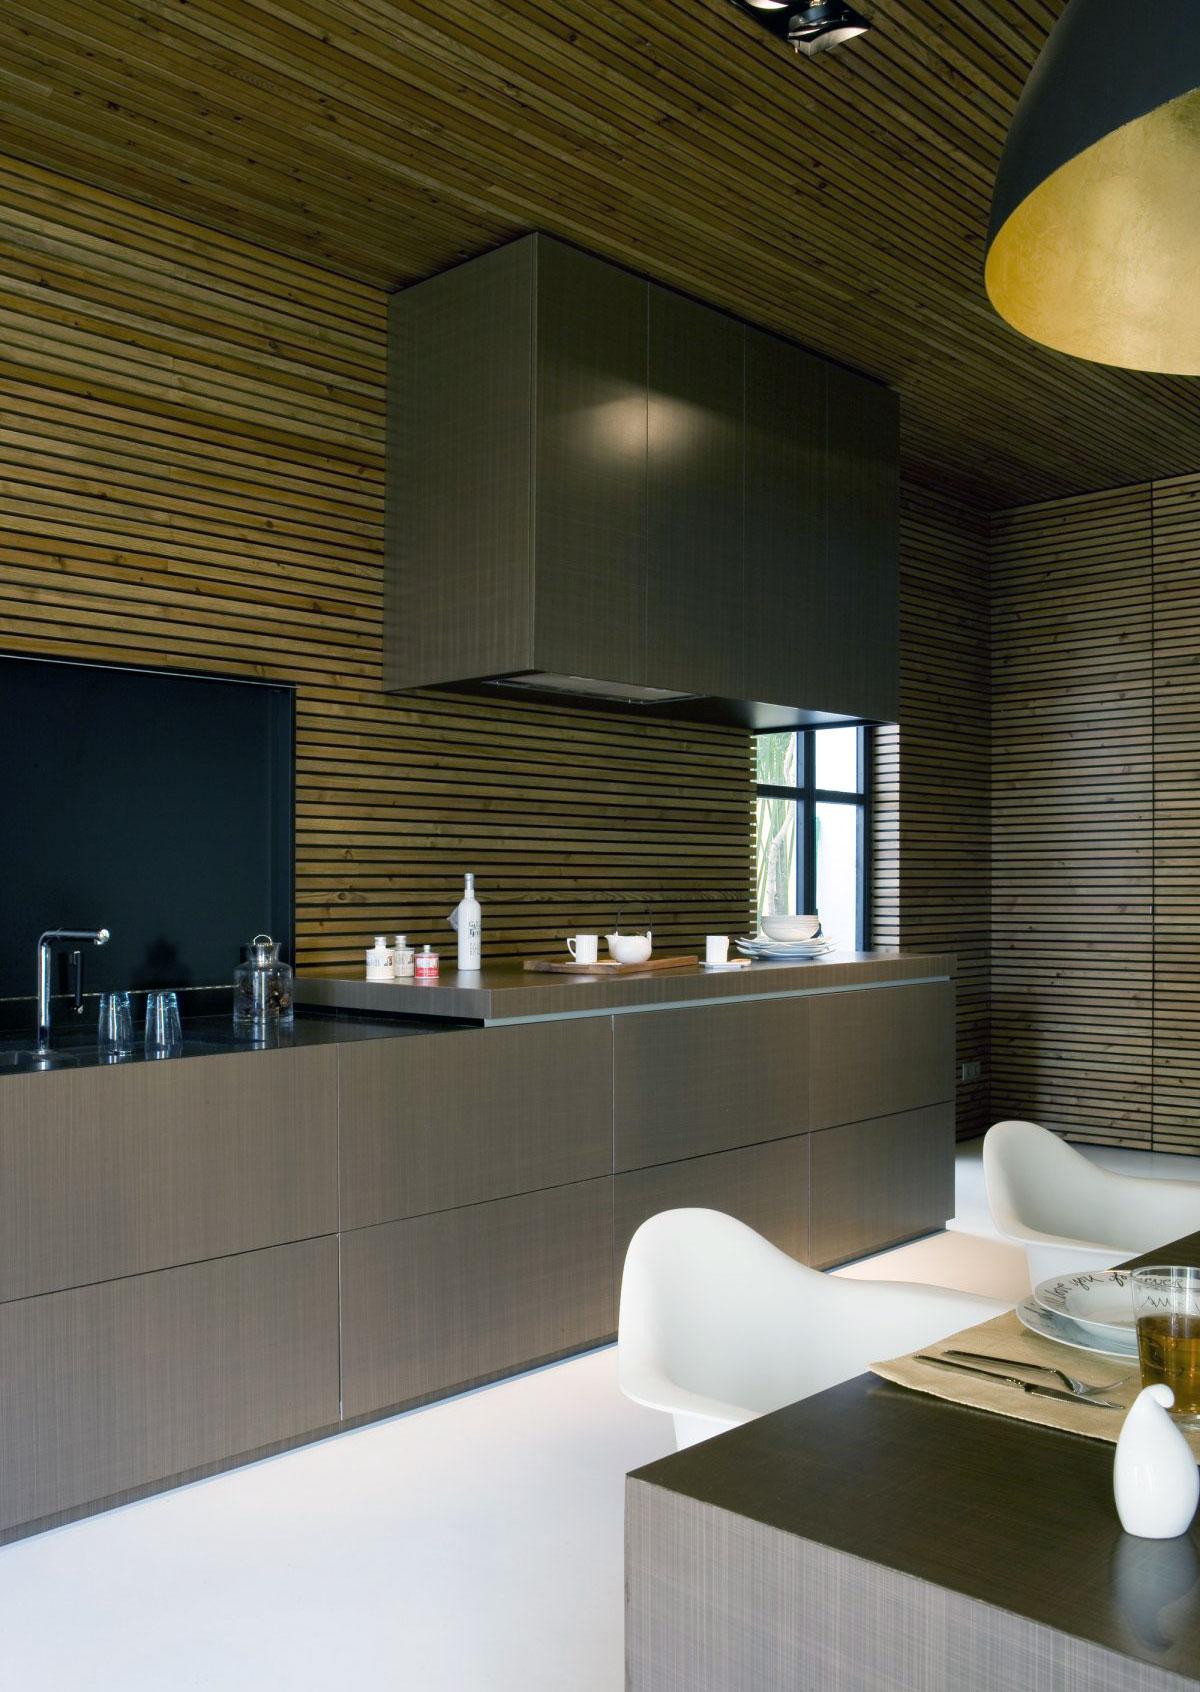 Modern kitchen with striped wall panel decor interior for Stripe interior design